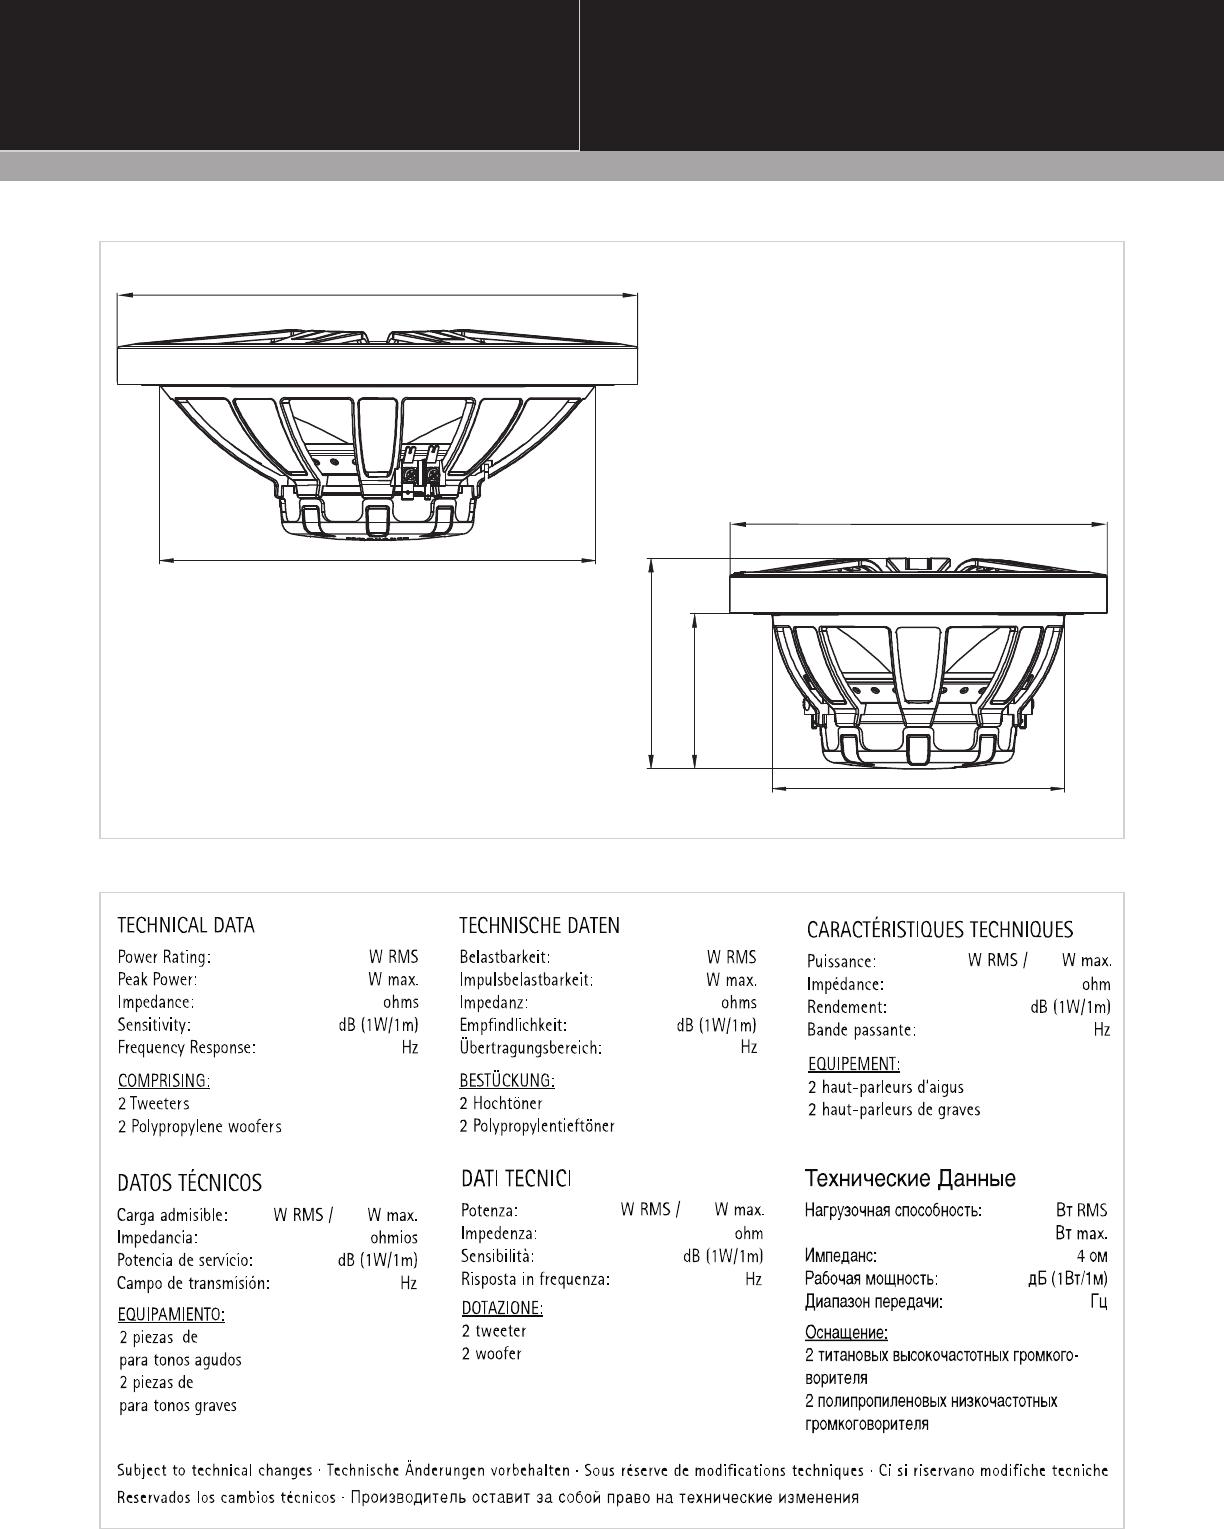 mb quart wiring diagram monster cable wiring diagram mb quart subwoofer wiring  diagram mb quart sound bar wiring diagram